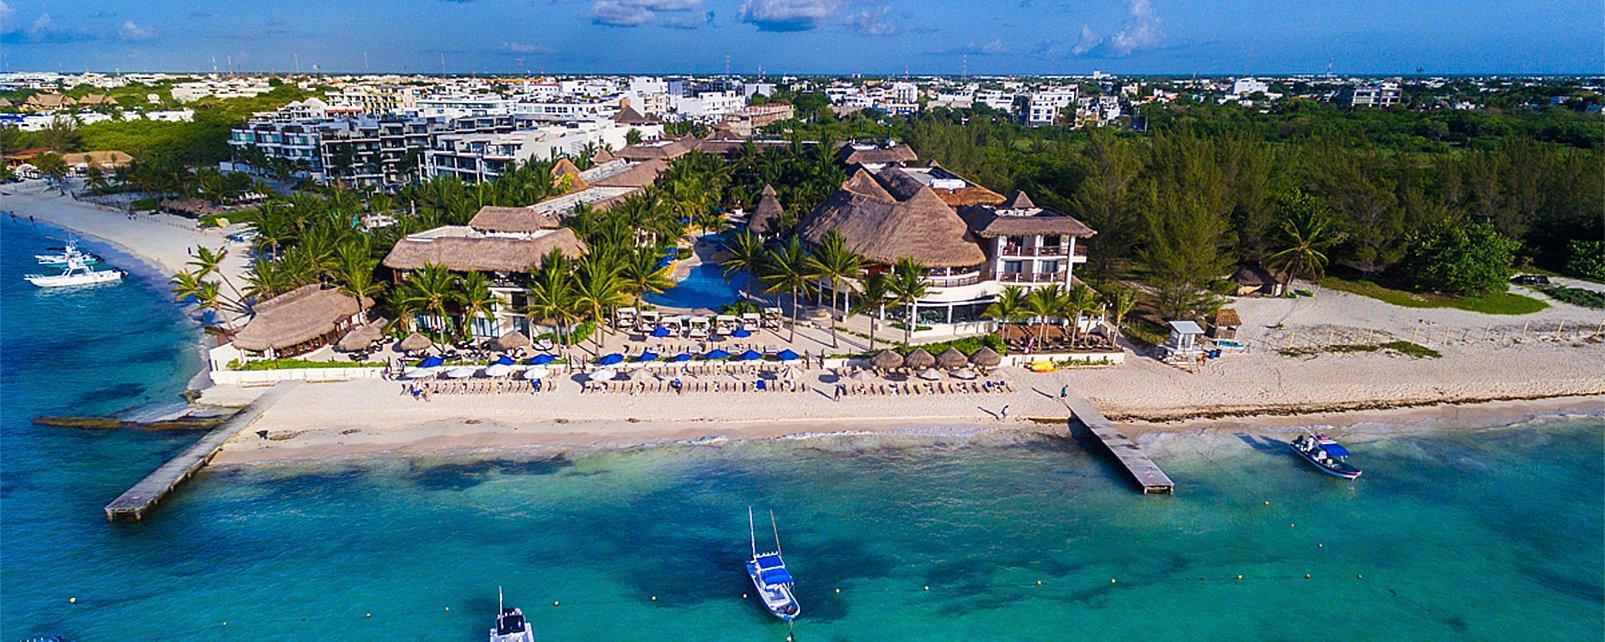 Hôtel The Reef Coco Beach